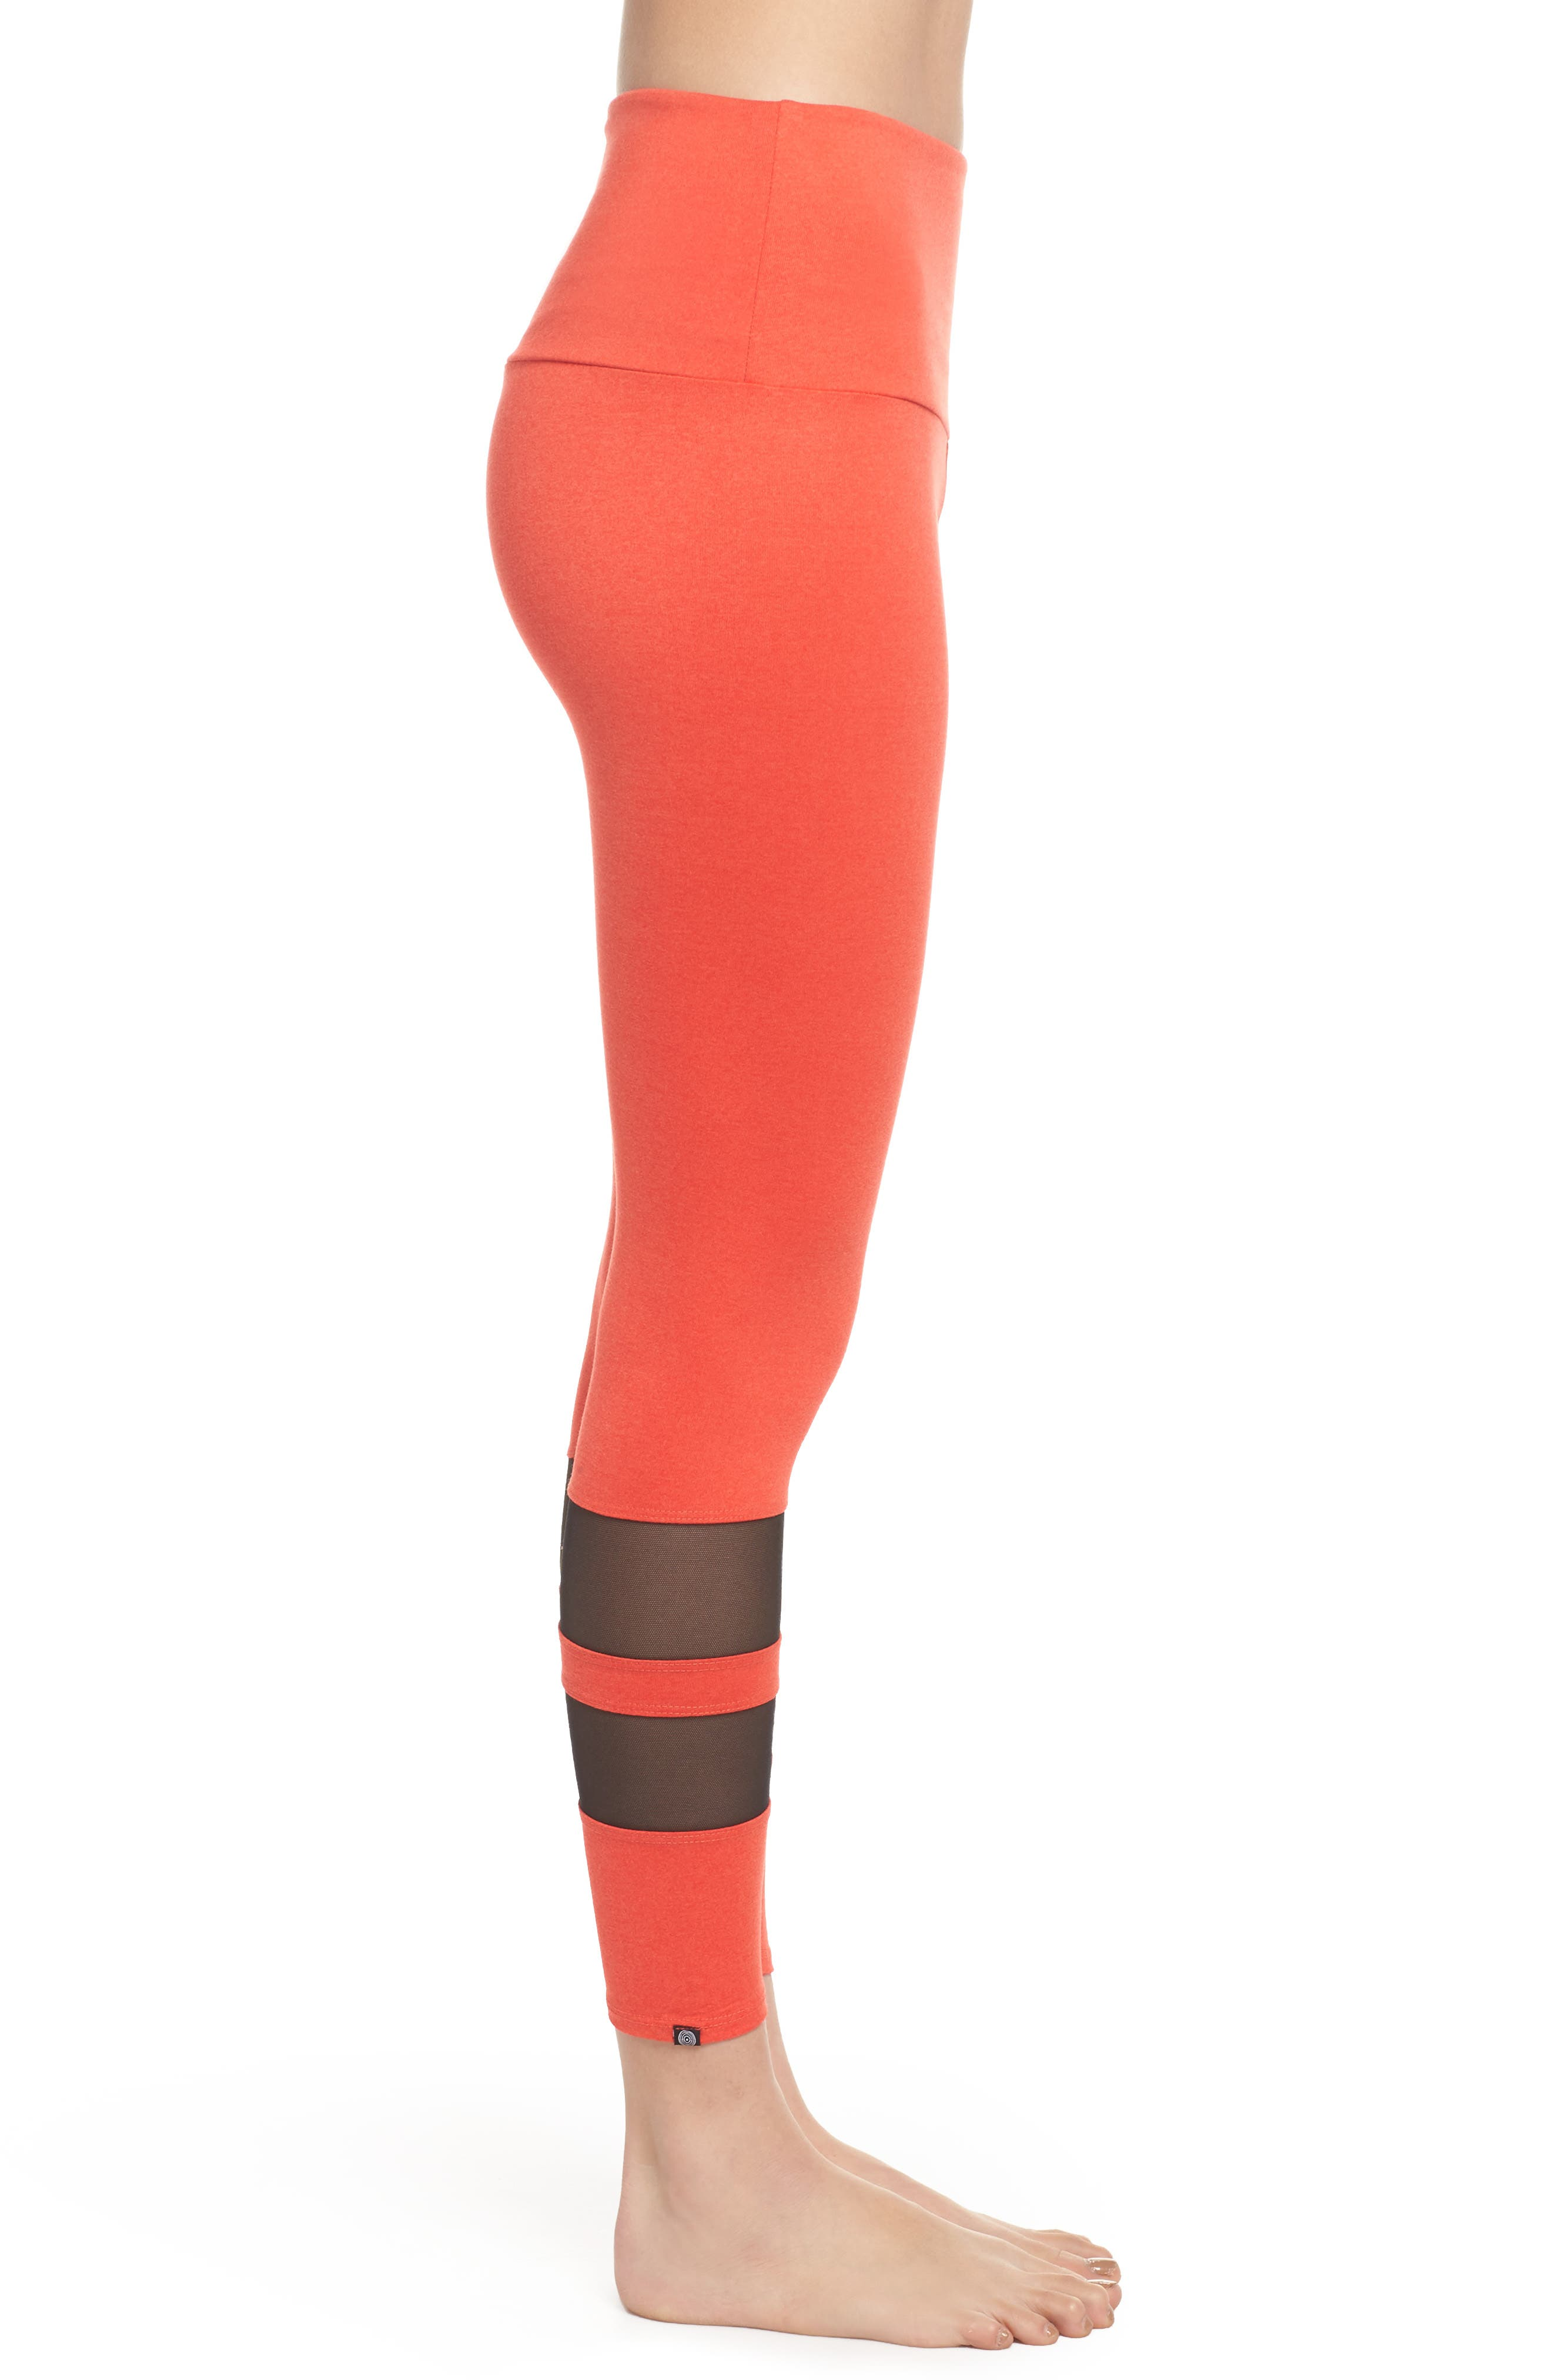 Racer Leggings,                             Alternate thumbnail 3, color,                             Coral Majestic/ Black Mesh